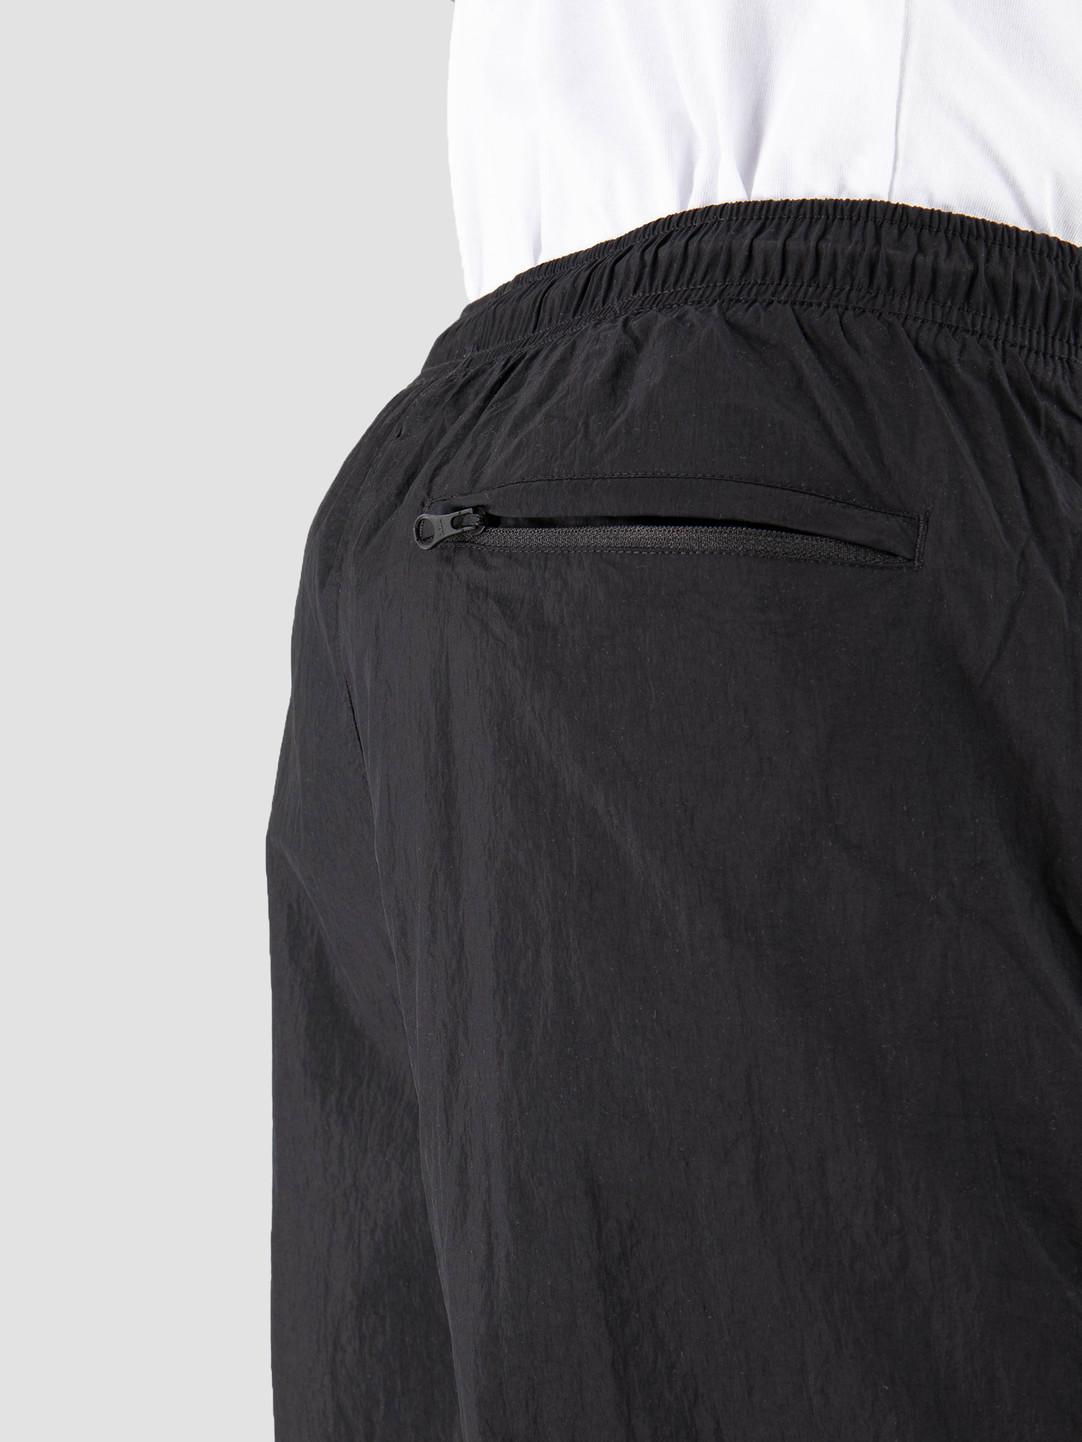 Nike Nike Sportswear Pant Black White Black Black Ar9894-010